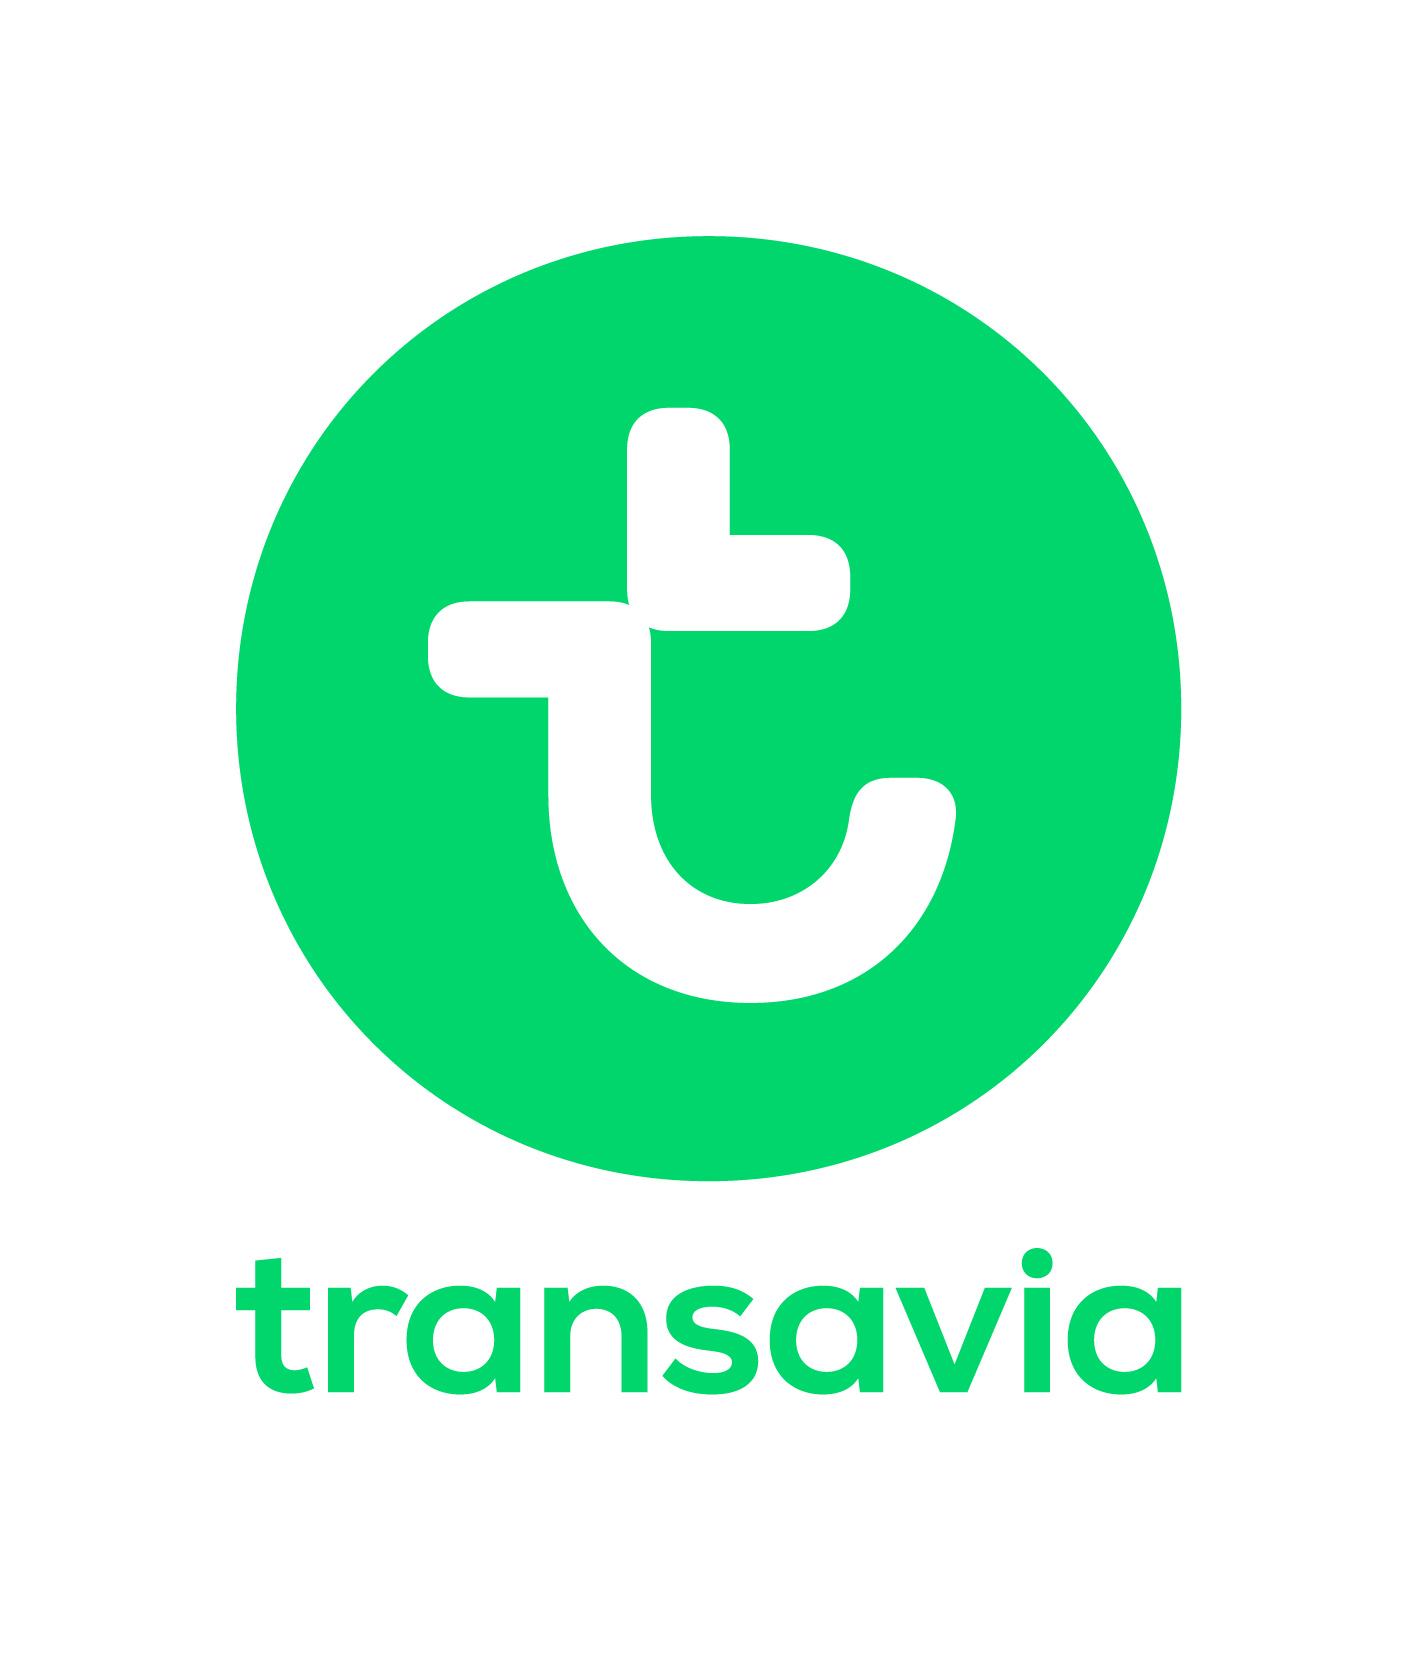 Logo Transavia - Aeropuertoinfo.com